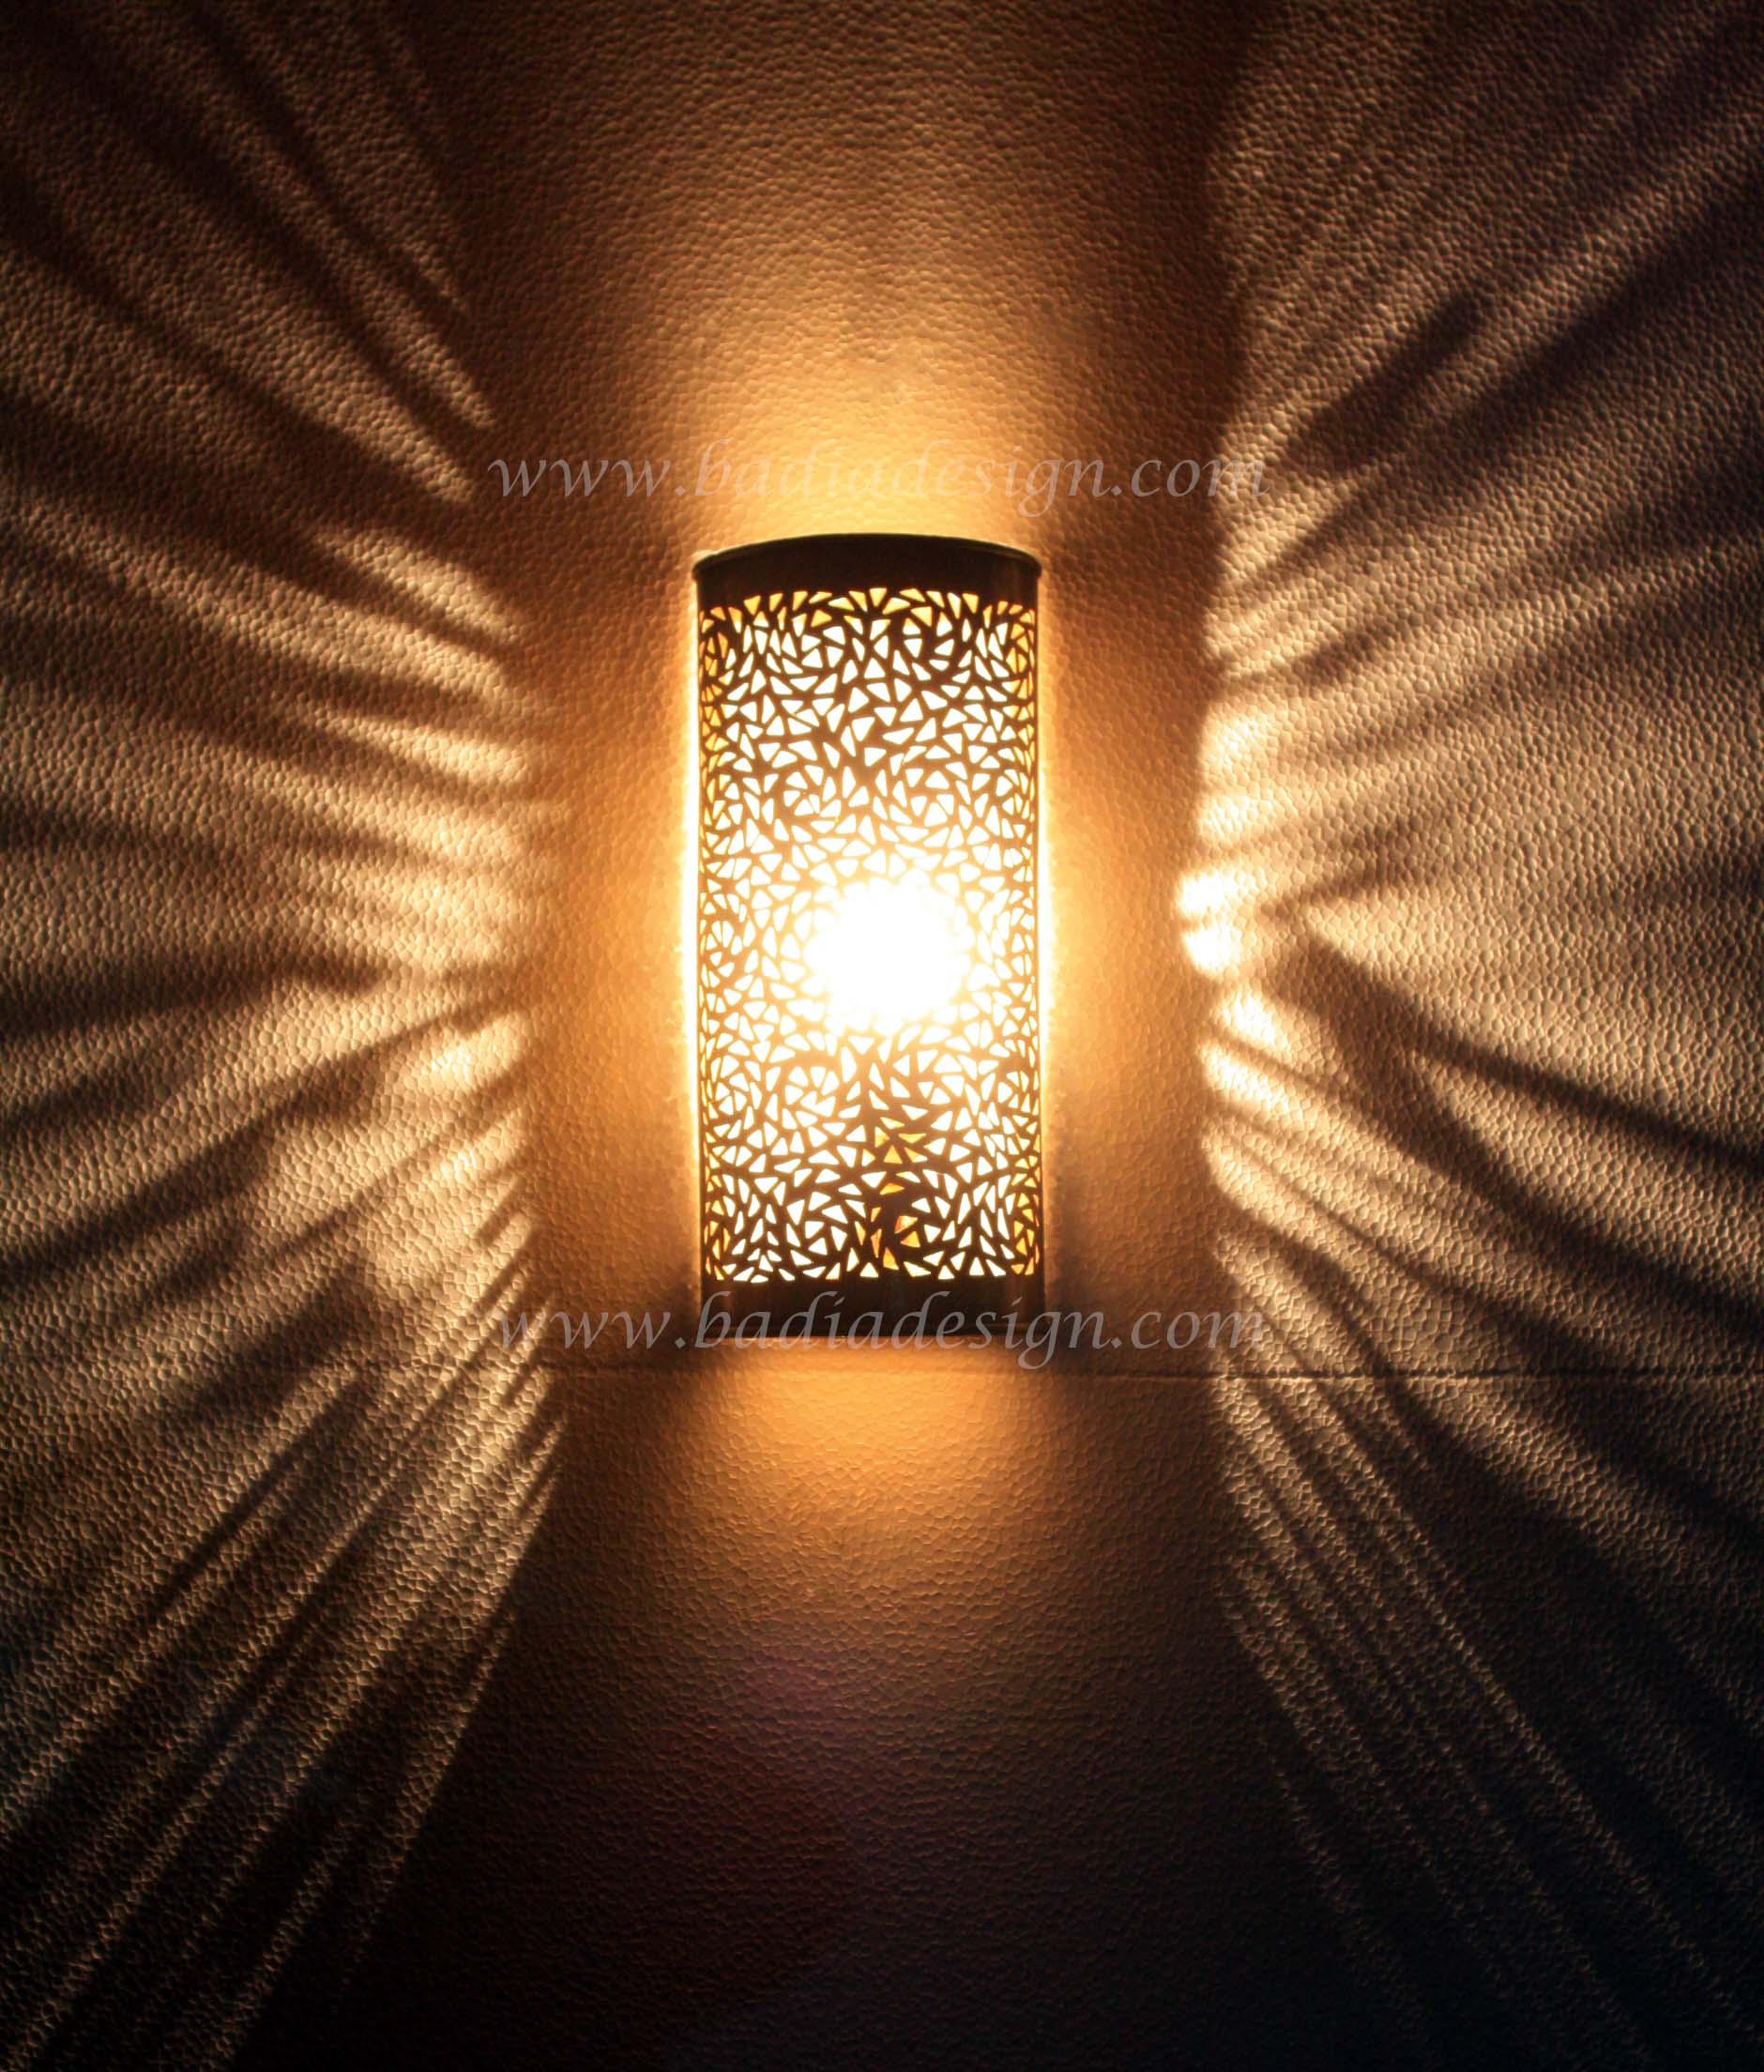 moroccan-lighting-fort-worth-texas.jpg